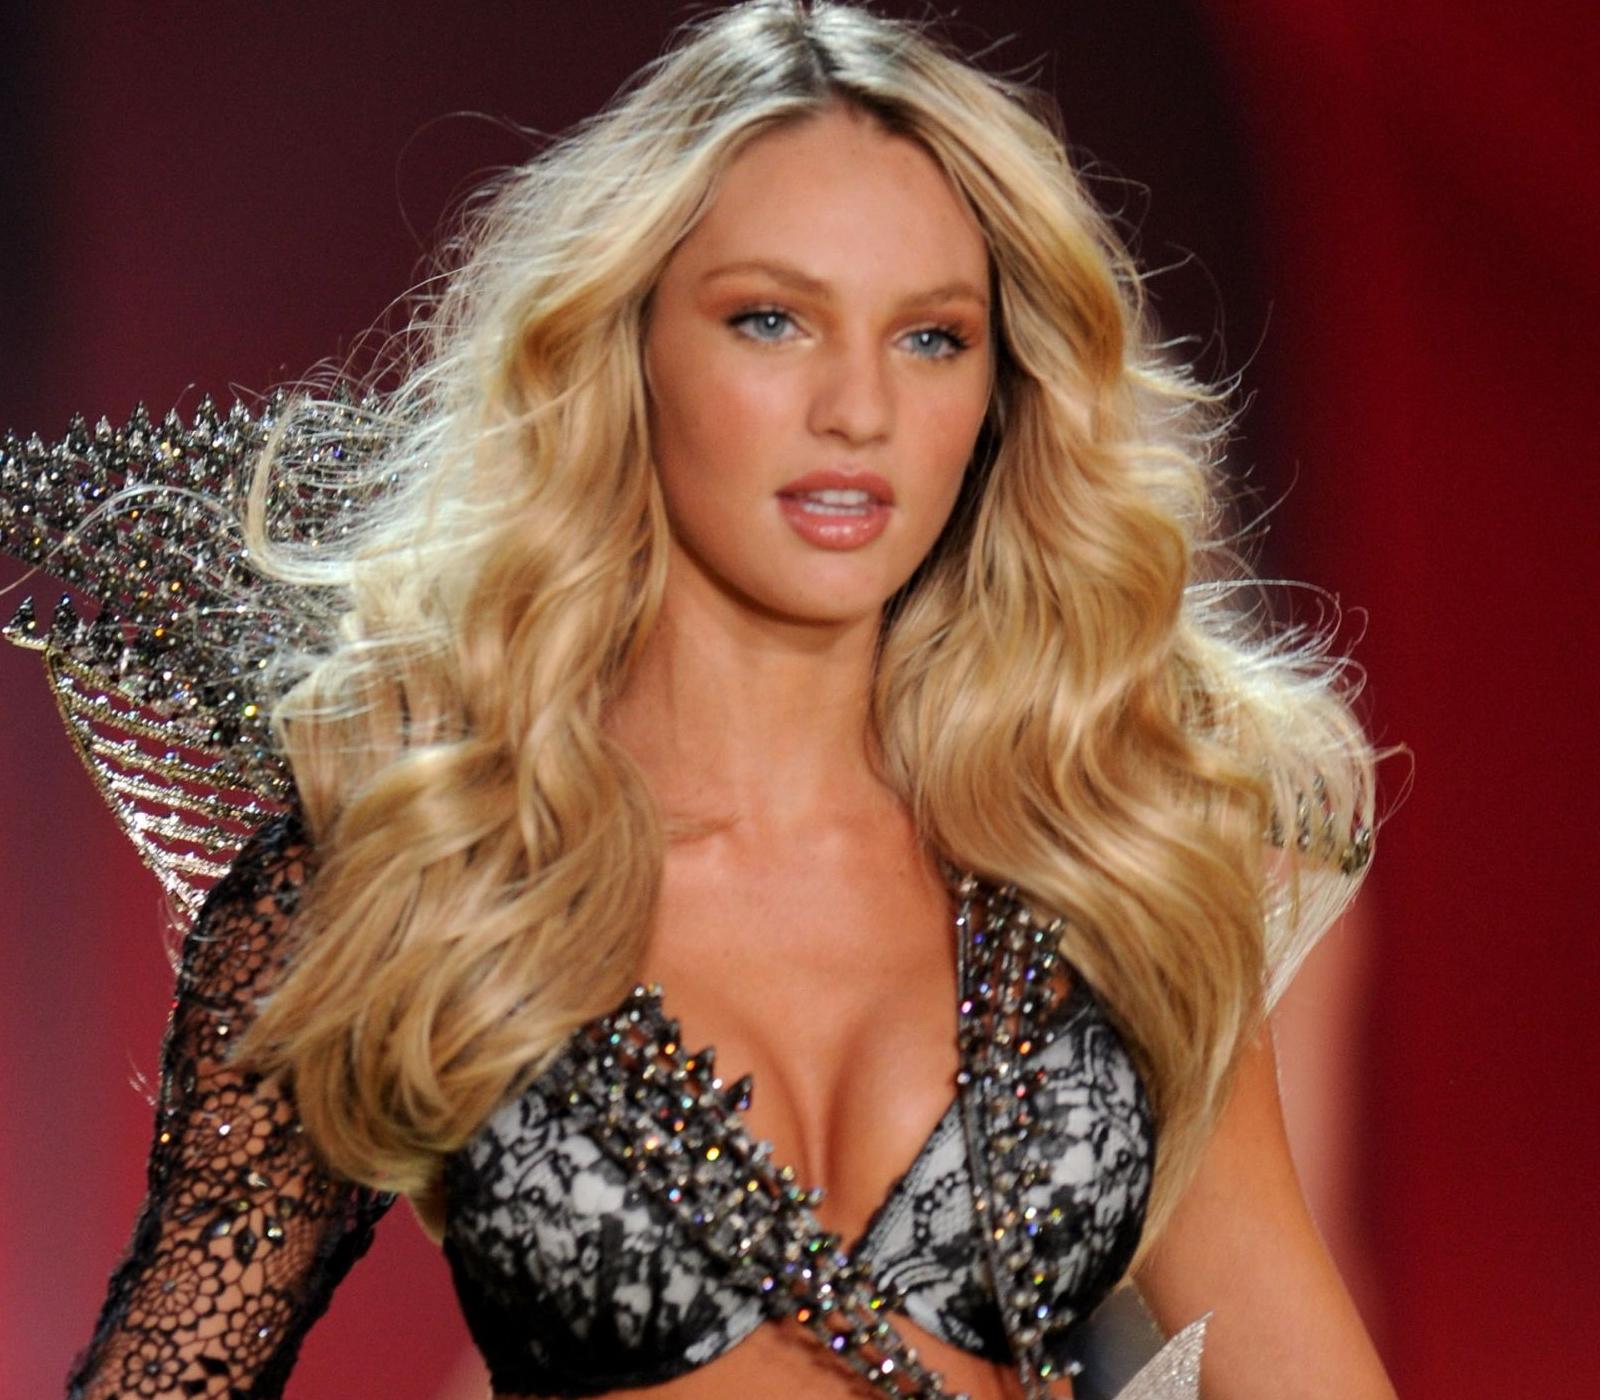 http://4.bp.blogspot.com/_Jgc-vQ1t70k/TOTw-blO3TI/AAAAAAAAAM0/RDX1qcTkyIE/s1600/Candice_Swanepoel_sexy_hot_lingerie_Victoria%2527s_Secret+Fashion_Show_1.jpg